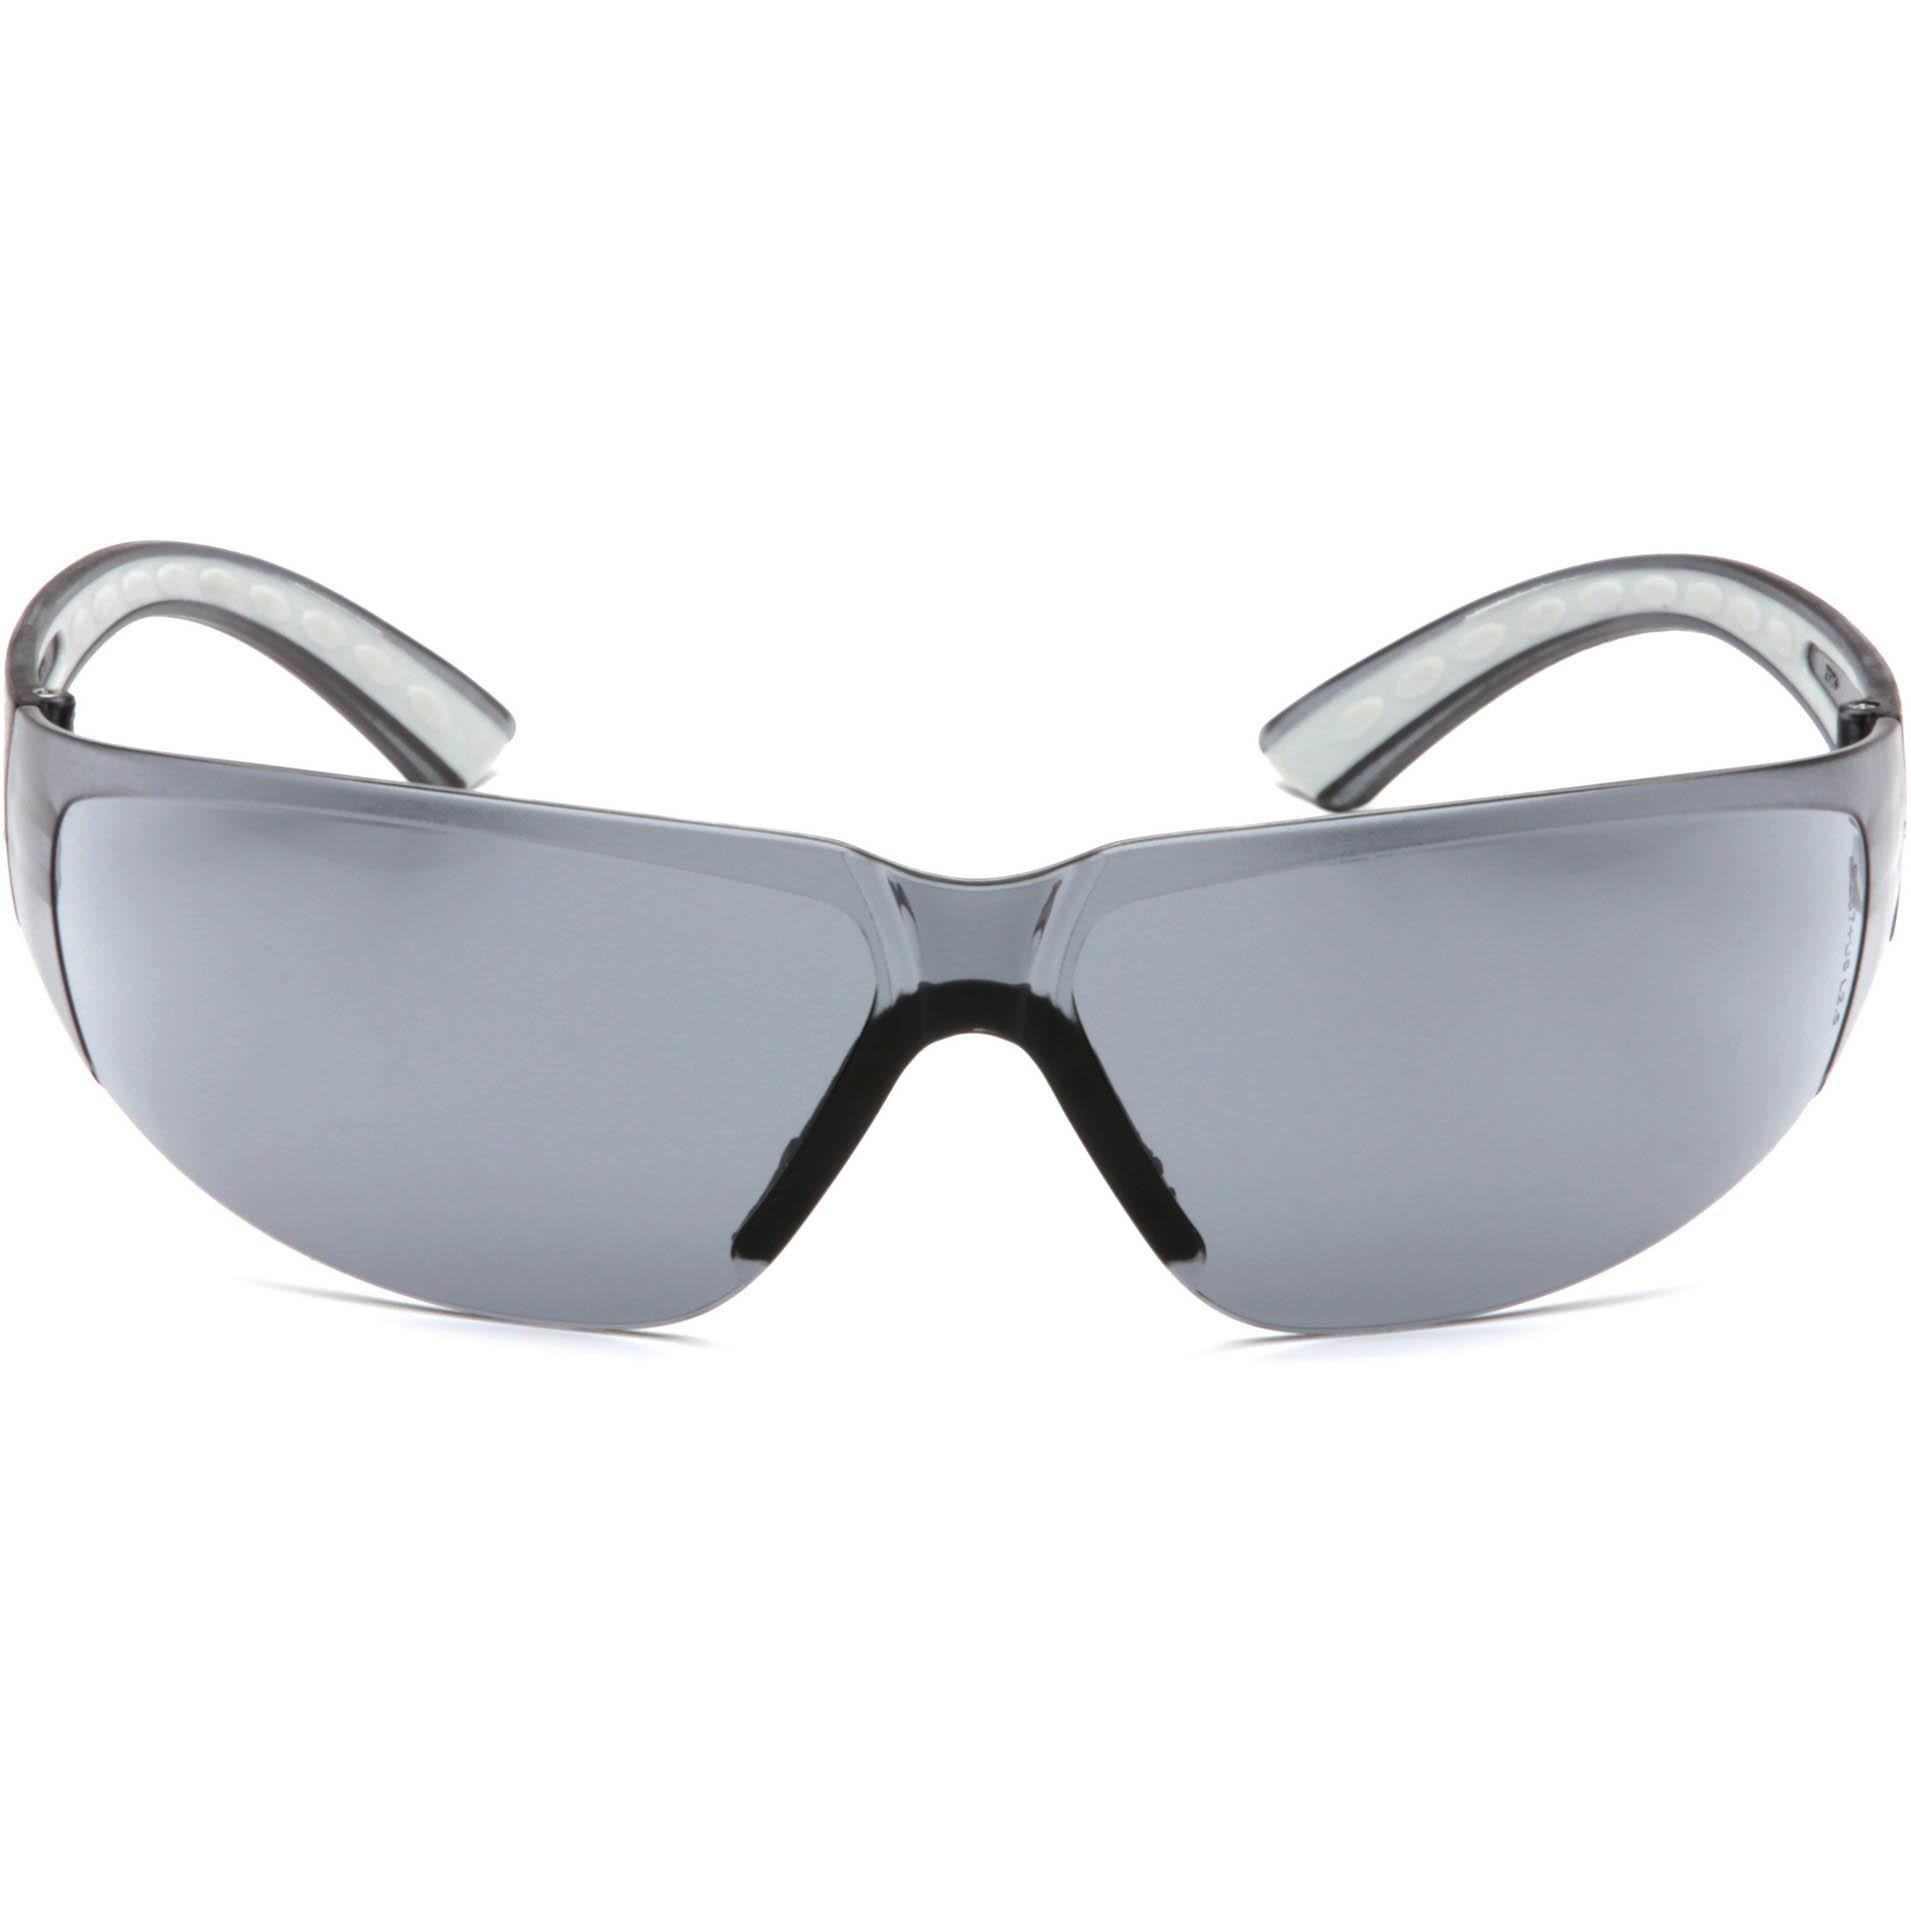 Glasses Gray Frame : Pyramex Cortez Safety Glasses - Gray Temples - Gray Frame ...